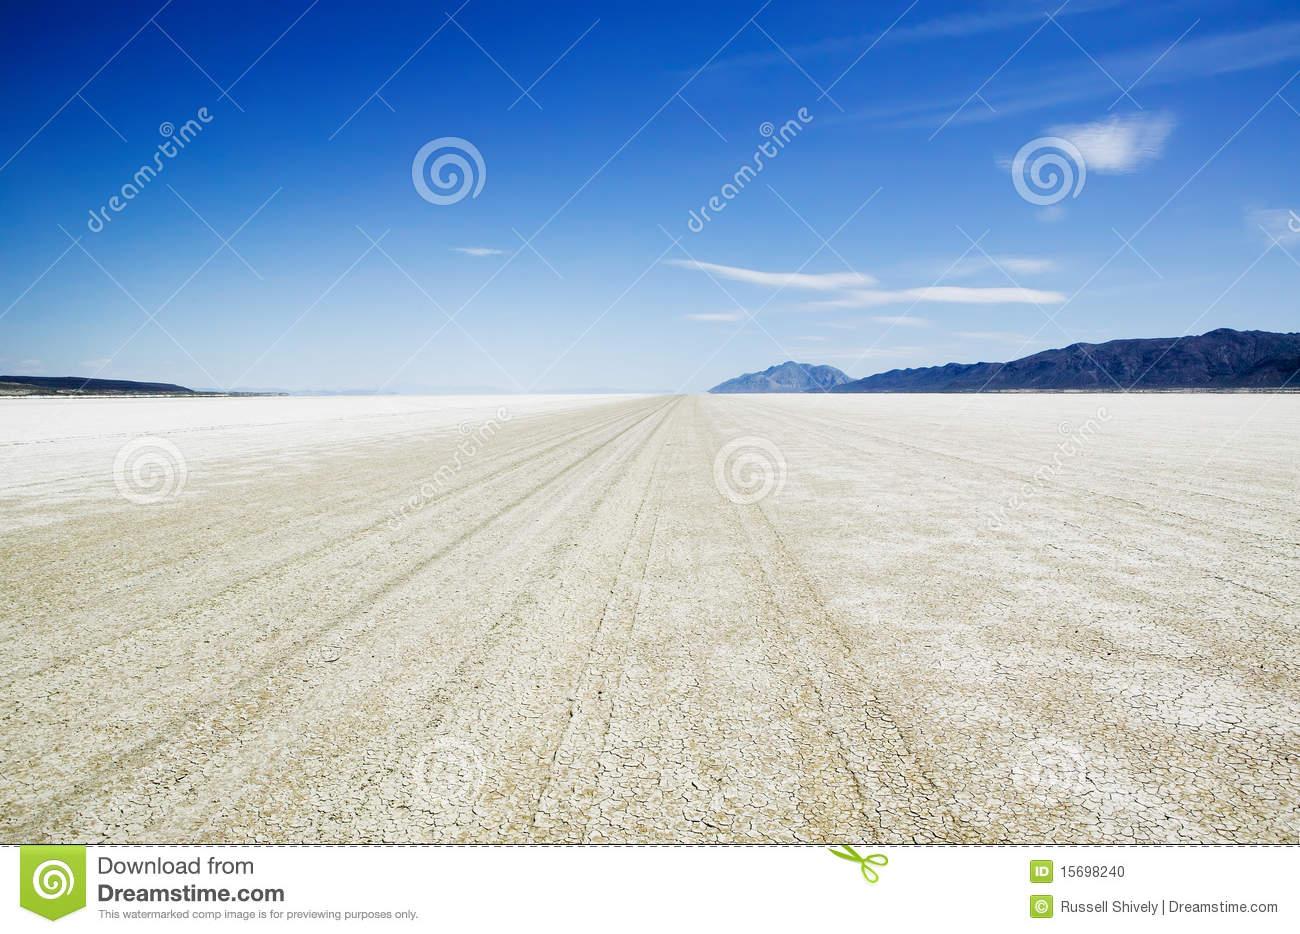 Salt Flat Playa Of The Black Rock Desert Stock Photo.